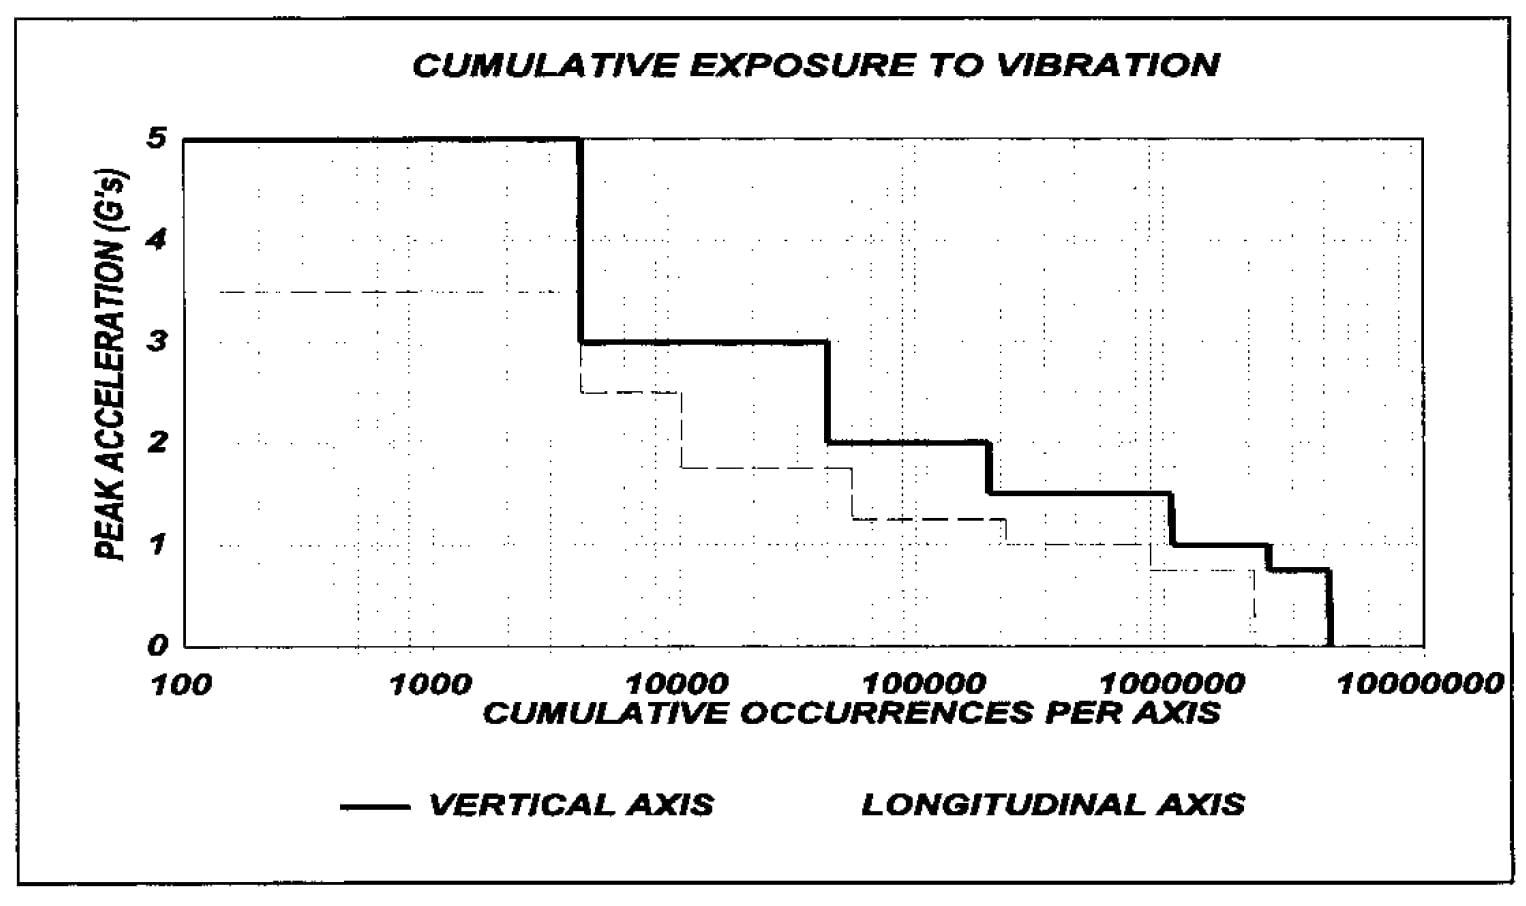 Cumulative Exposure to Vibration Graph